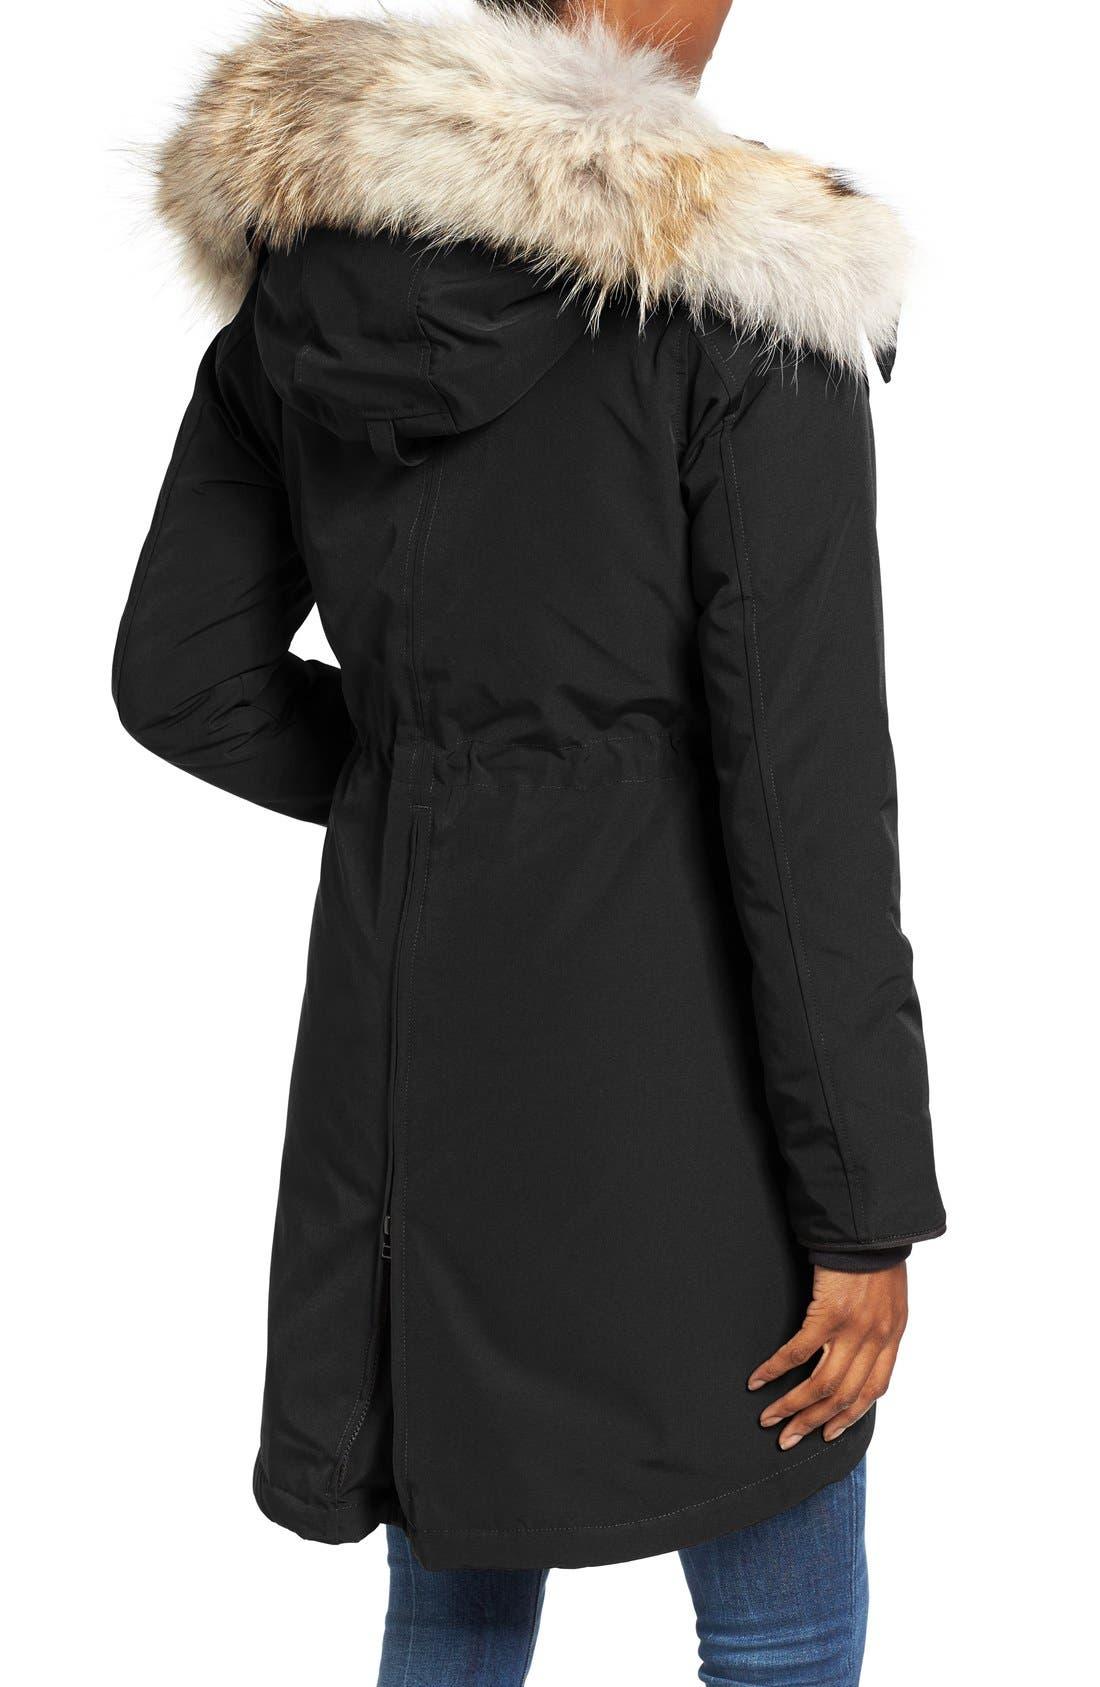 CANADA GOOSE, Rossclair Genuine Coyote Fur Trim Down Parka, Alternate thumbnail 4, color, BLACK